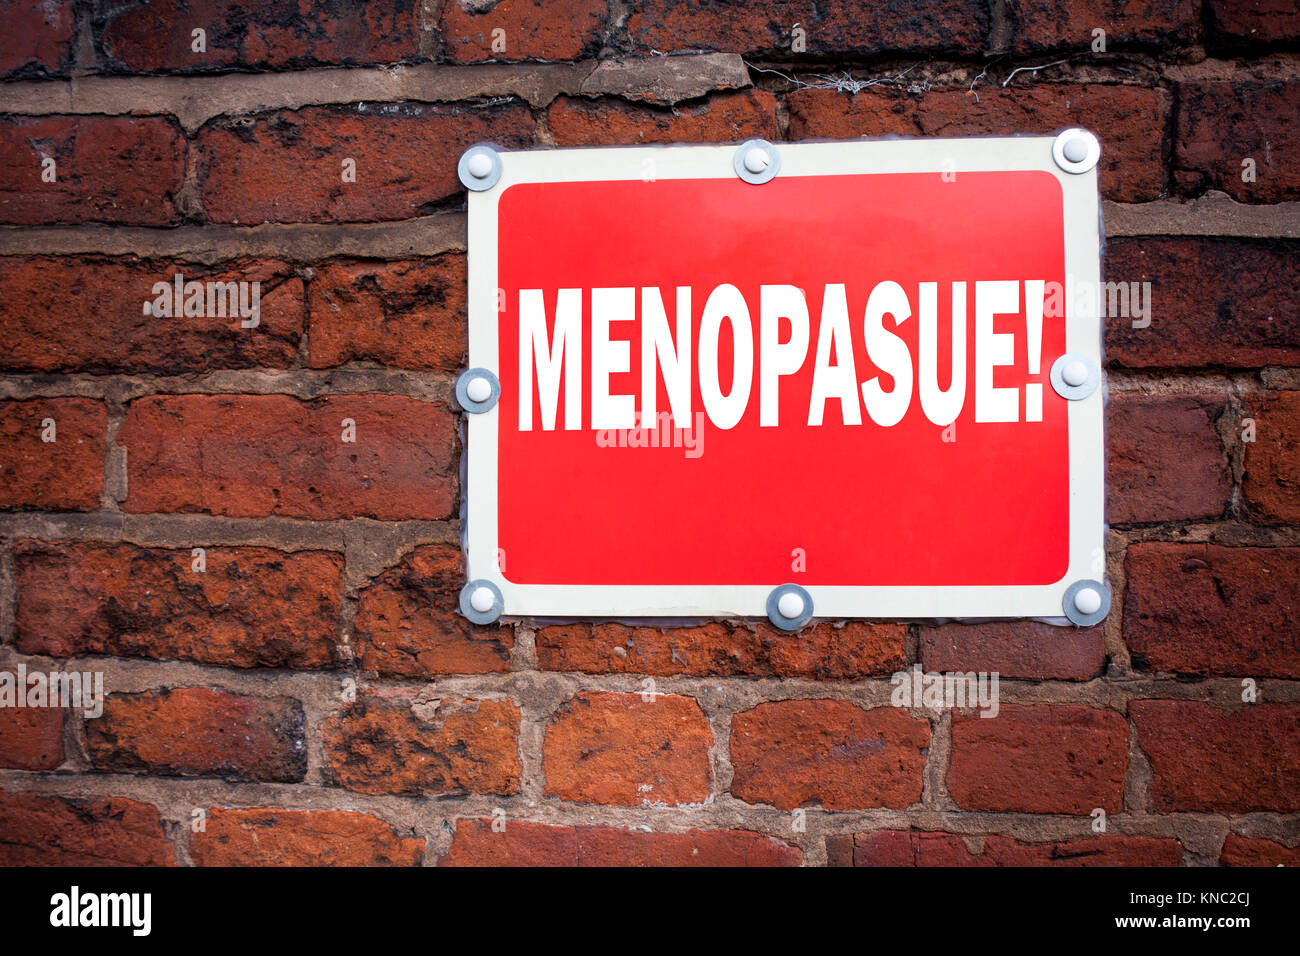 Concept Menopause Stock Photos & Concept Menopause Stock ...